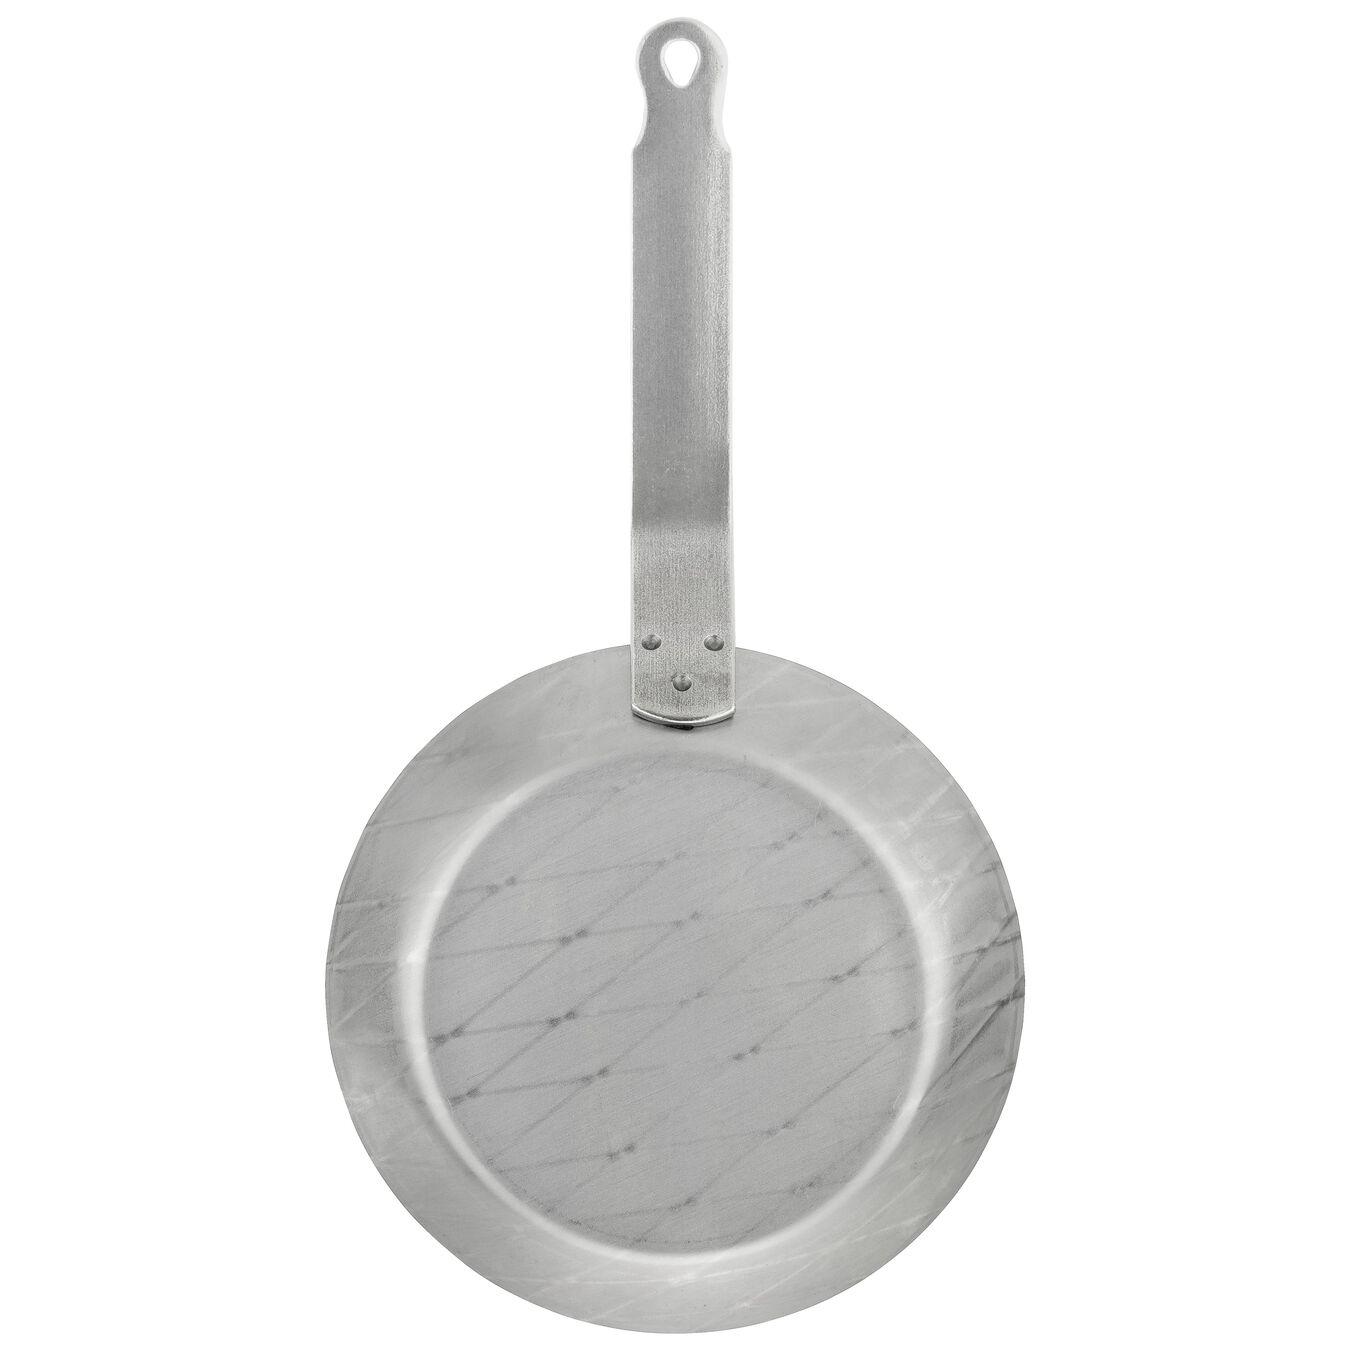 Bratpfanne 20 cm, Kohlenstoffstahl, Grau,,large 2